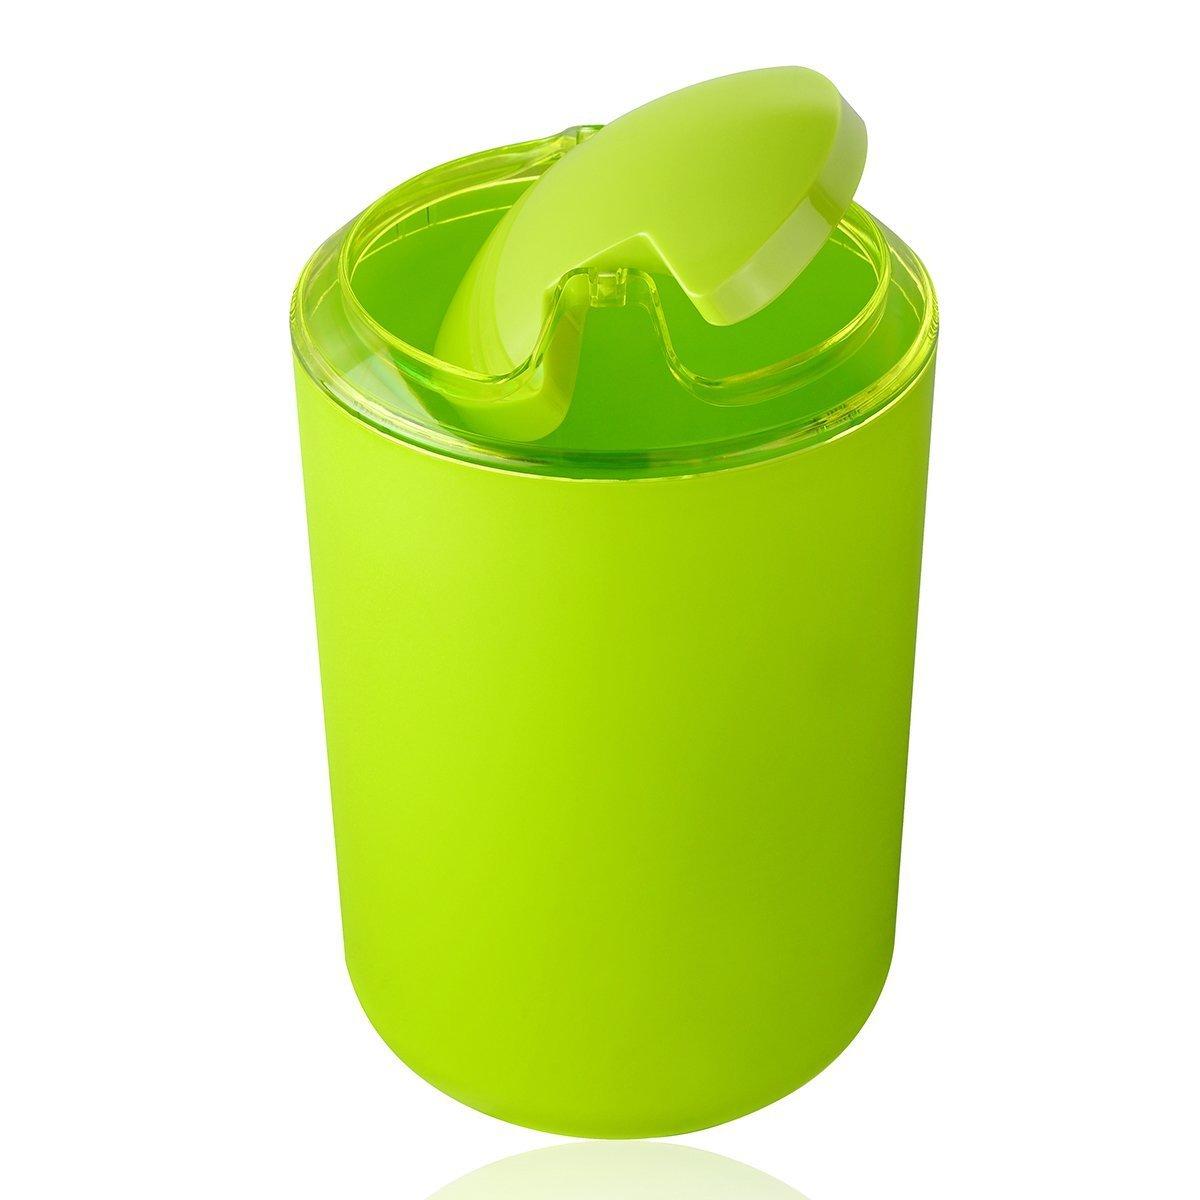 6 Pcs Bathroom Accessory Set Toothbrush Holder Bin Soap Dish Dispenser Tumbler Apple Green Colour